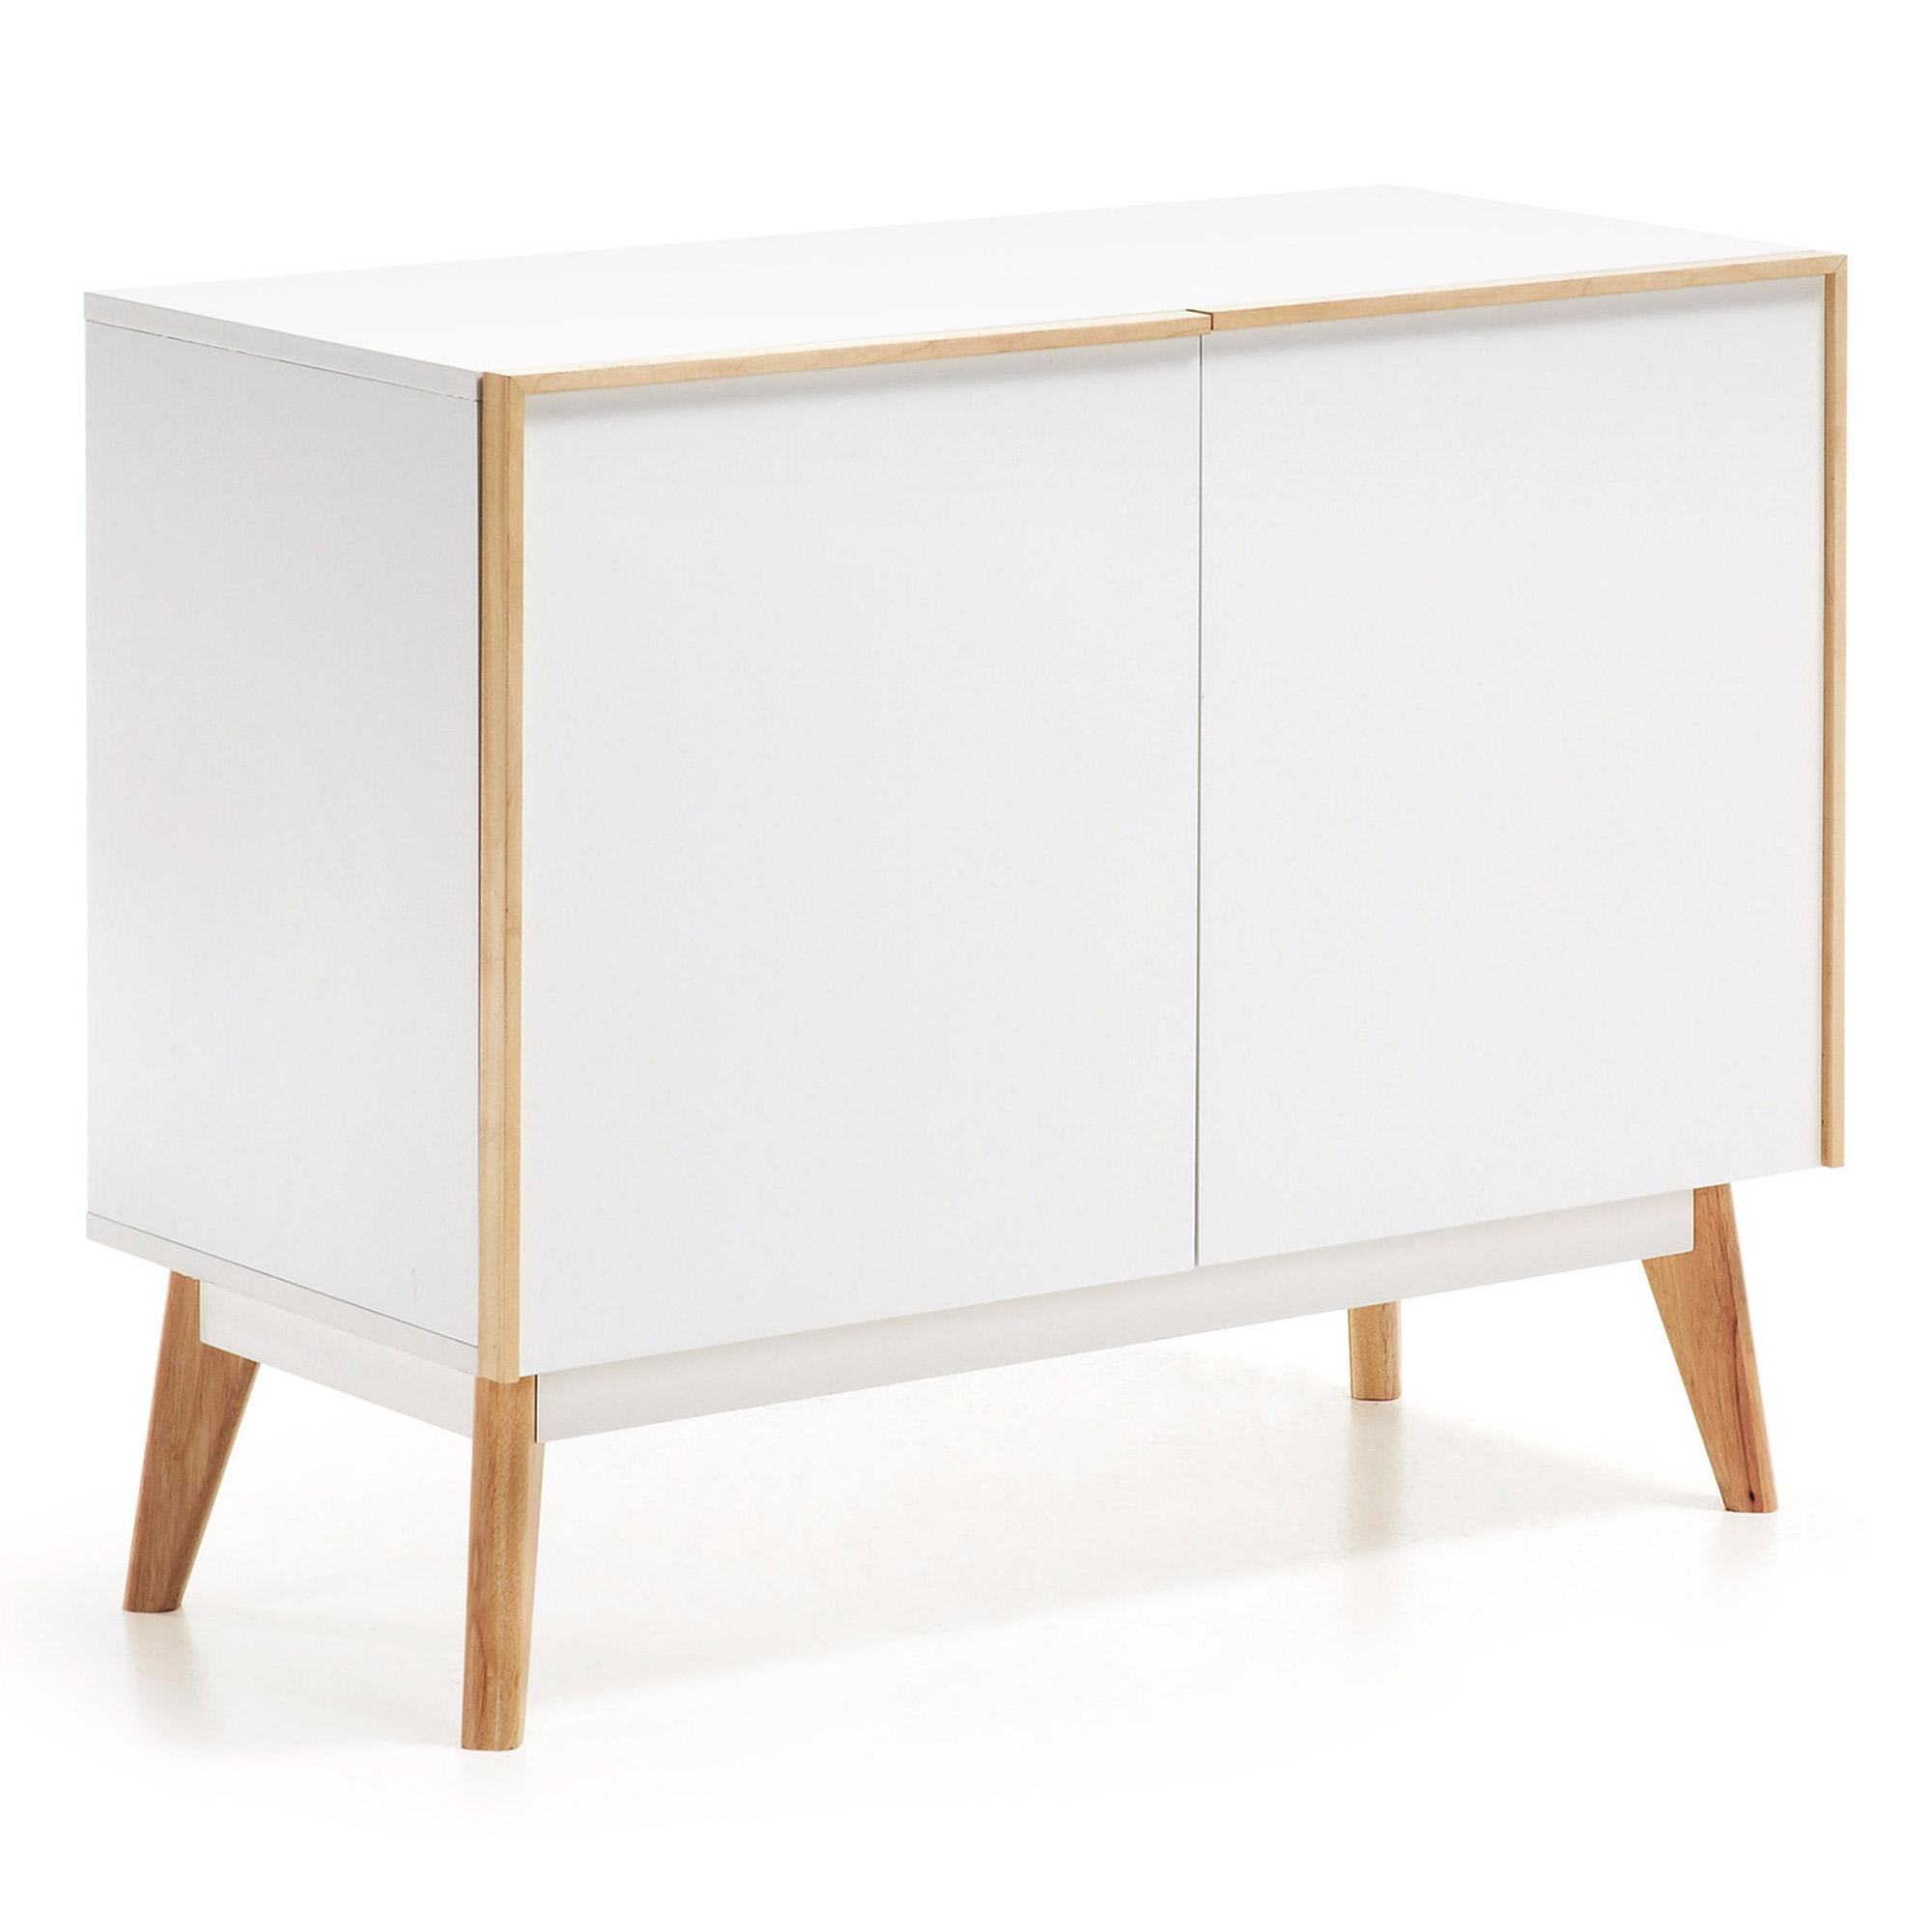 Kave Home - Melan Sideboard 90 x 72 cm | Wohnzimmer > Schränke > Sideboards | Kave Home